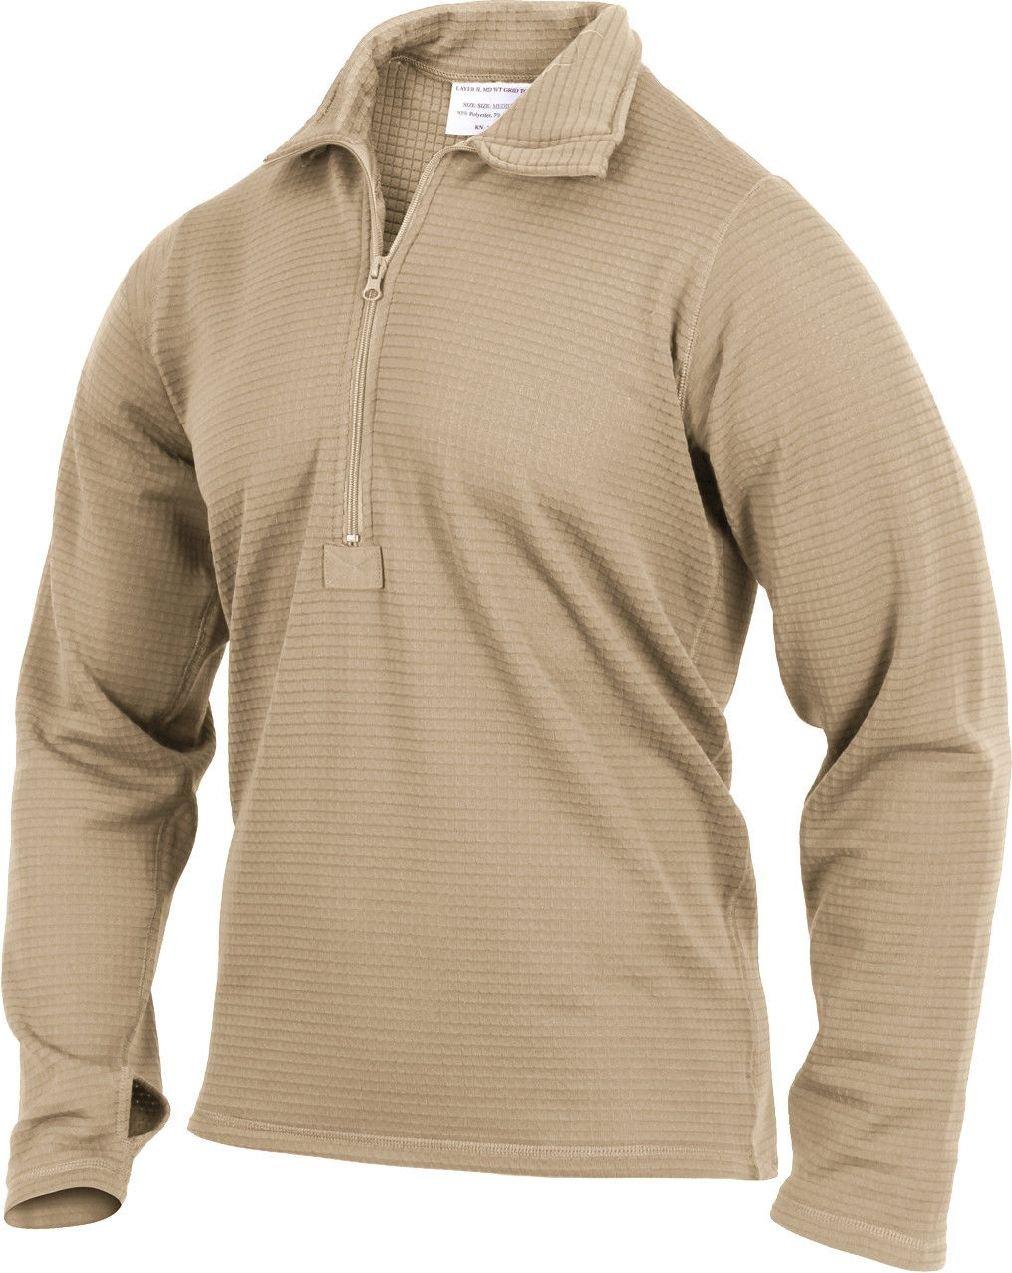 Desert Sand Gen III Waffle Knit Thermal Underwear Zip Up Collar Top Shirt by AMYE